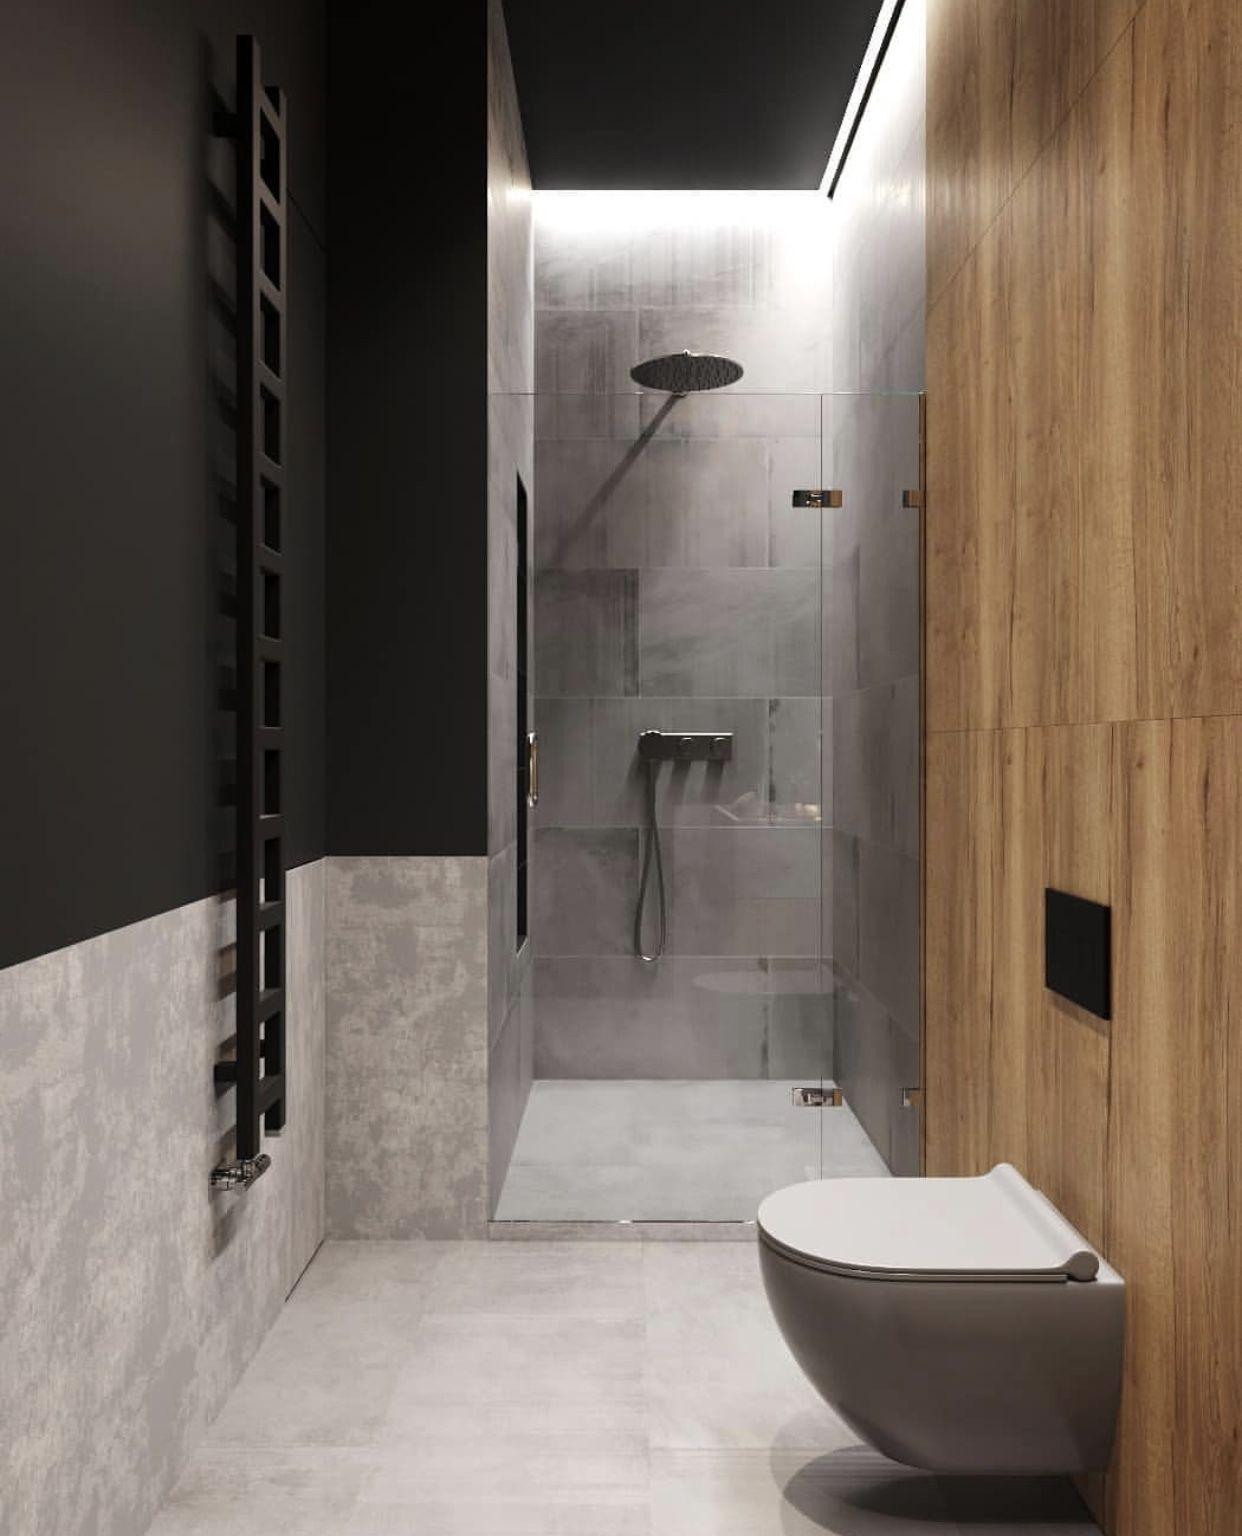 Pin By Philip Leung On Vannaya Bathroom Design Inspiration Modern Bathroom Design Contemporary Bathroom Designs